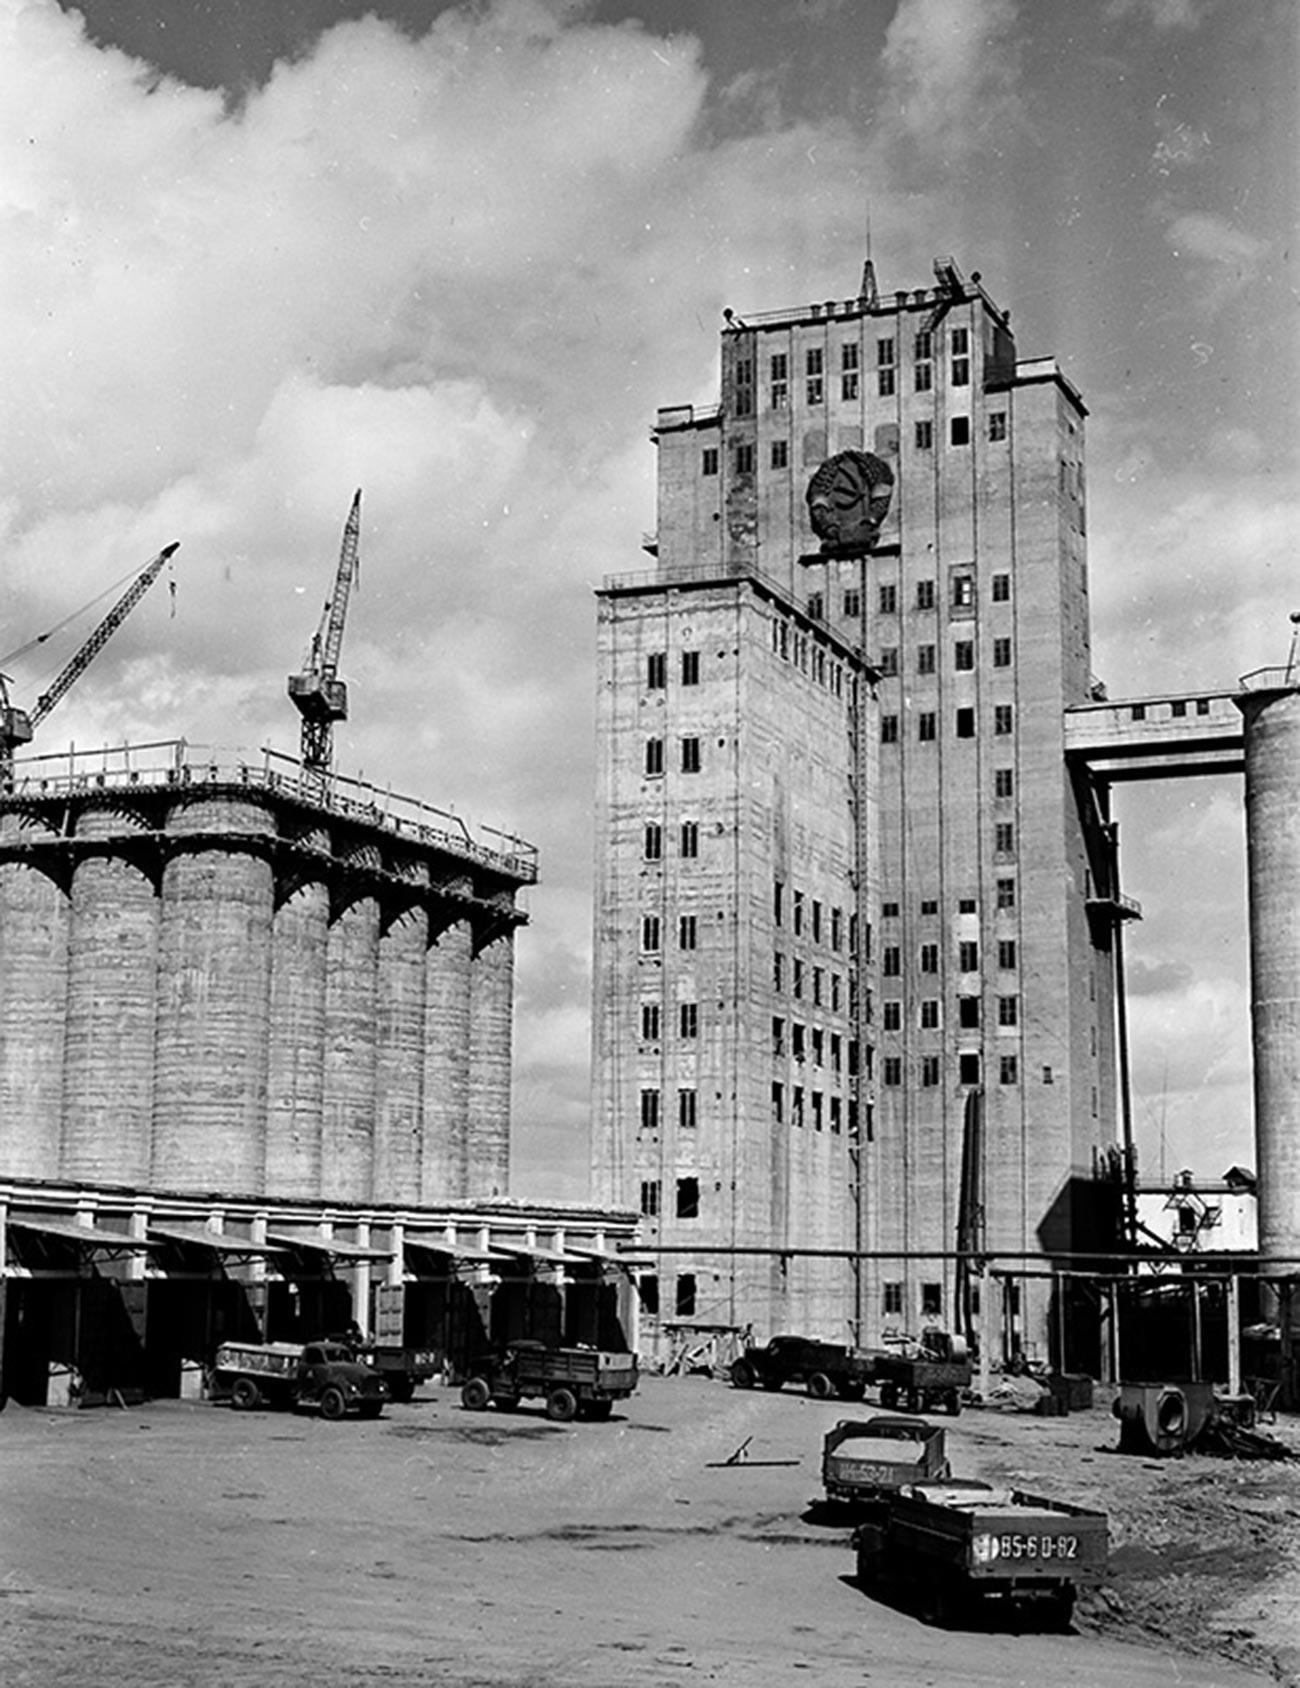 Lift biji-bijian dengan lambang Soviet di Kota Kostanay, Kazakhstan,1959.